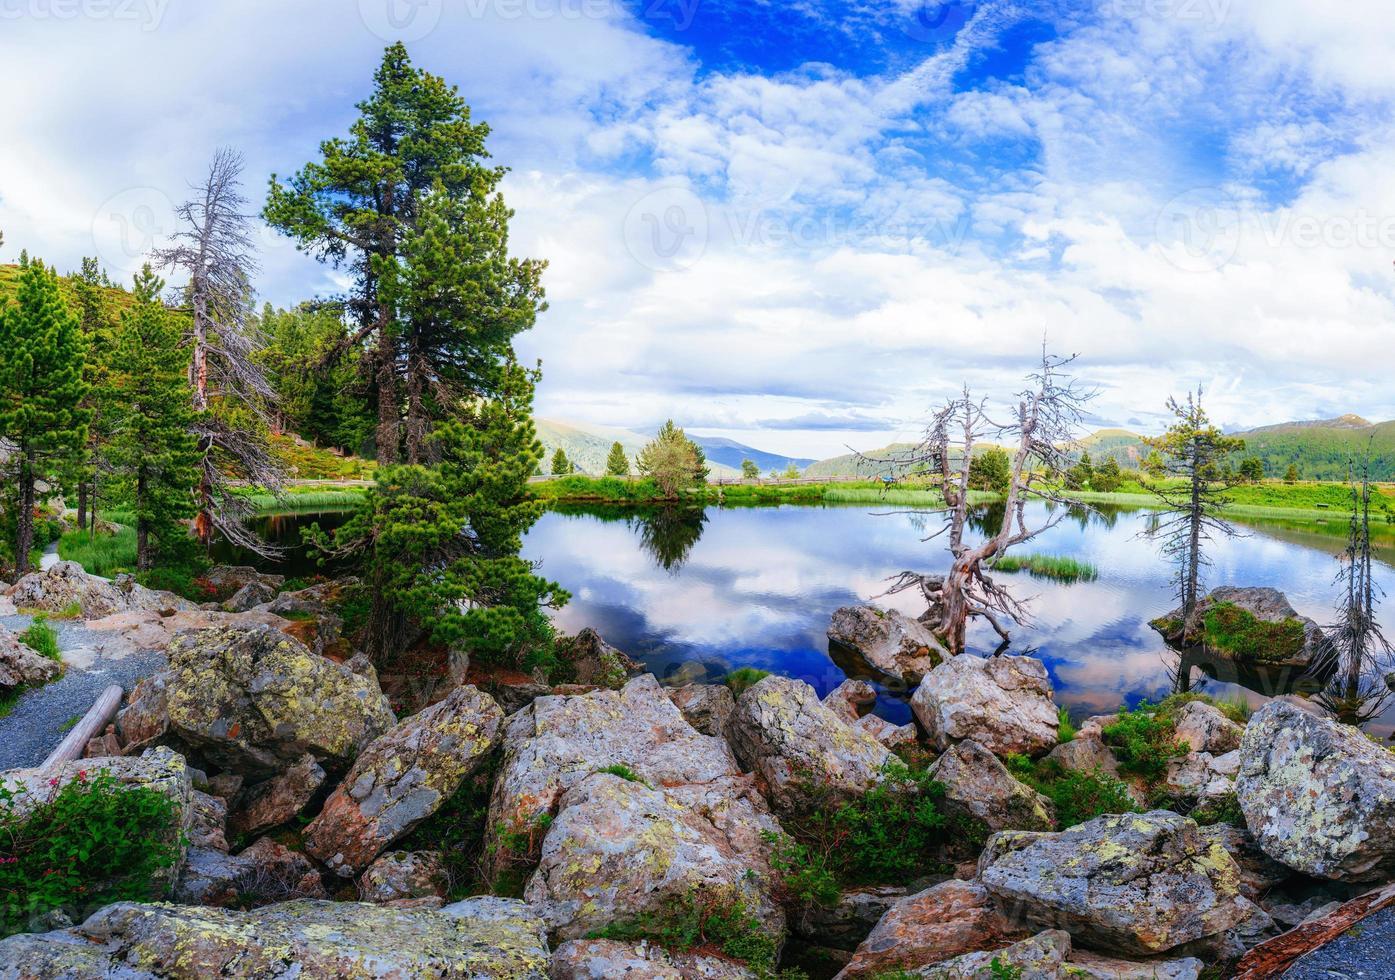 lago entre montanhas foto